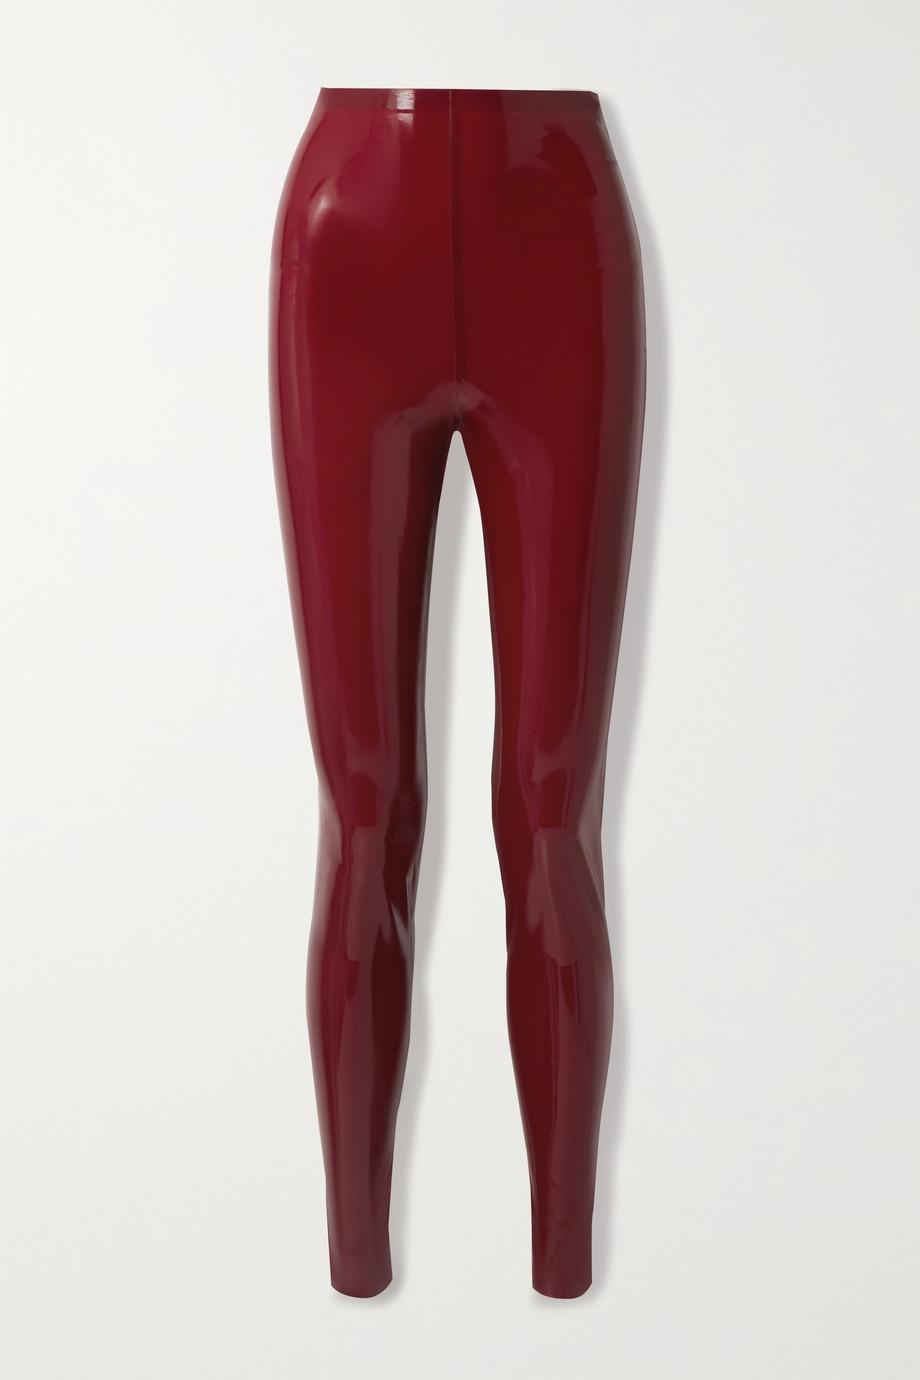 SAINT LAURENT Latex leggings + Latex Care cleaning kit 3 x 30ml bottles (Vividress, Vivishine, Viviclean)